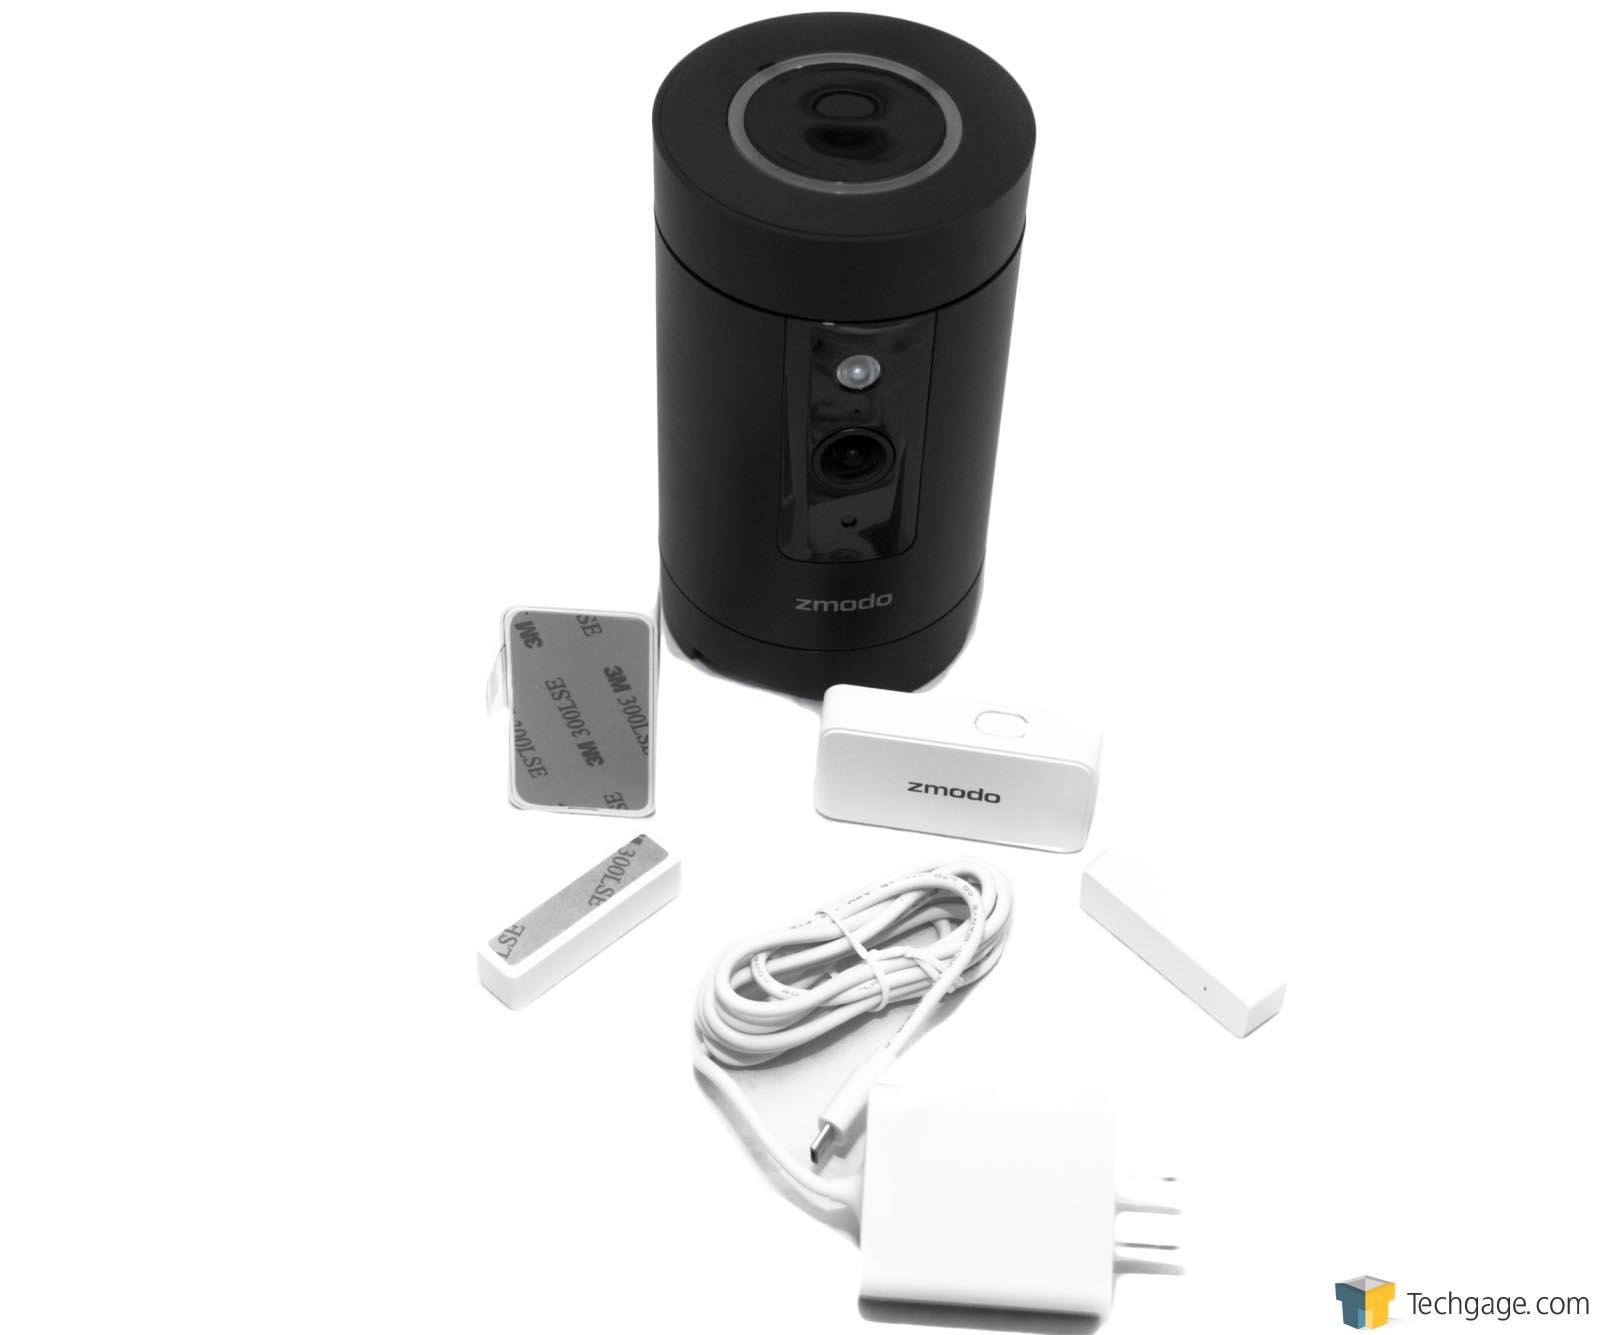 Zmodo Home Security Camera System